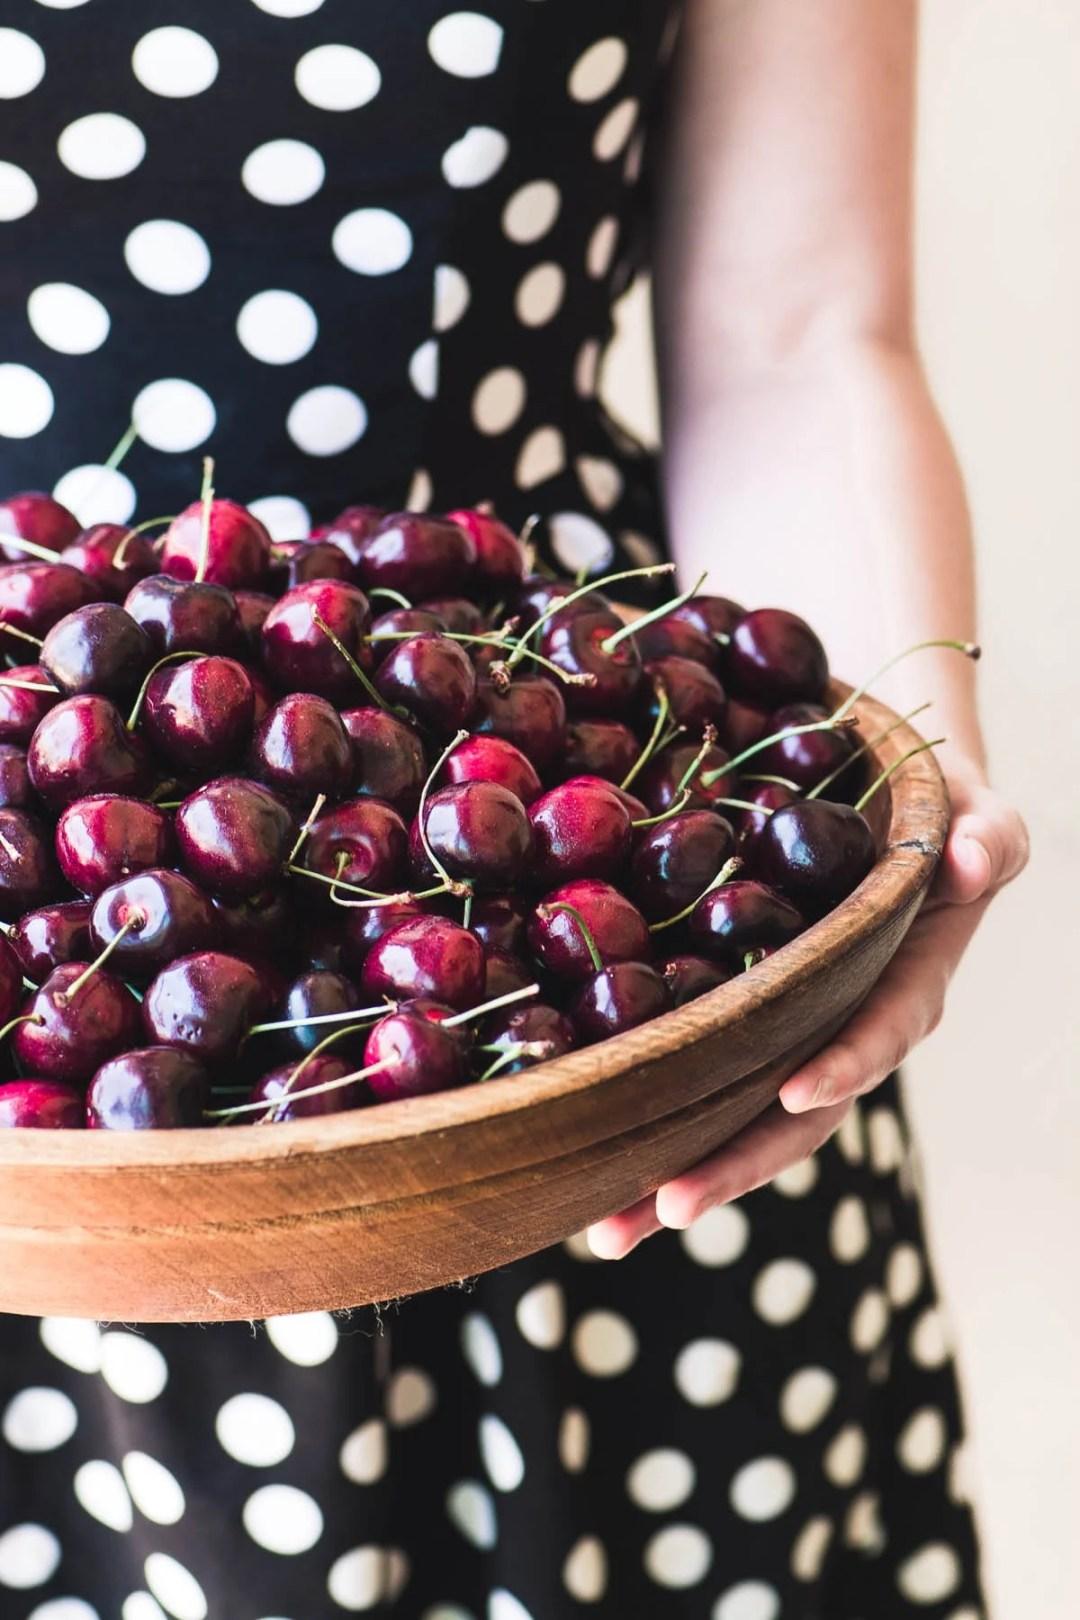 Girl in a polka dot dress holding a bowl of fresh cherries